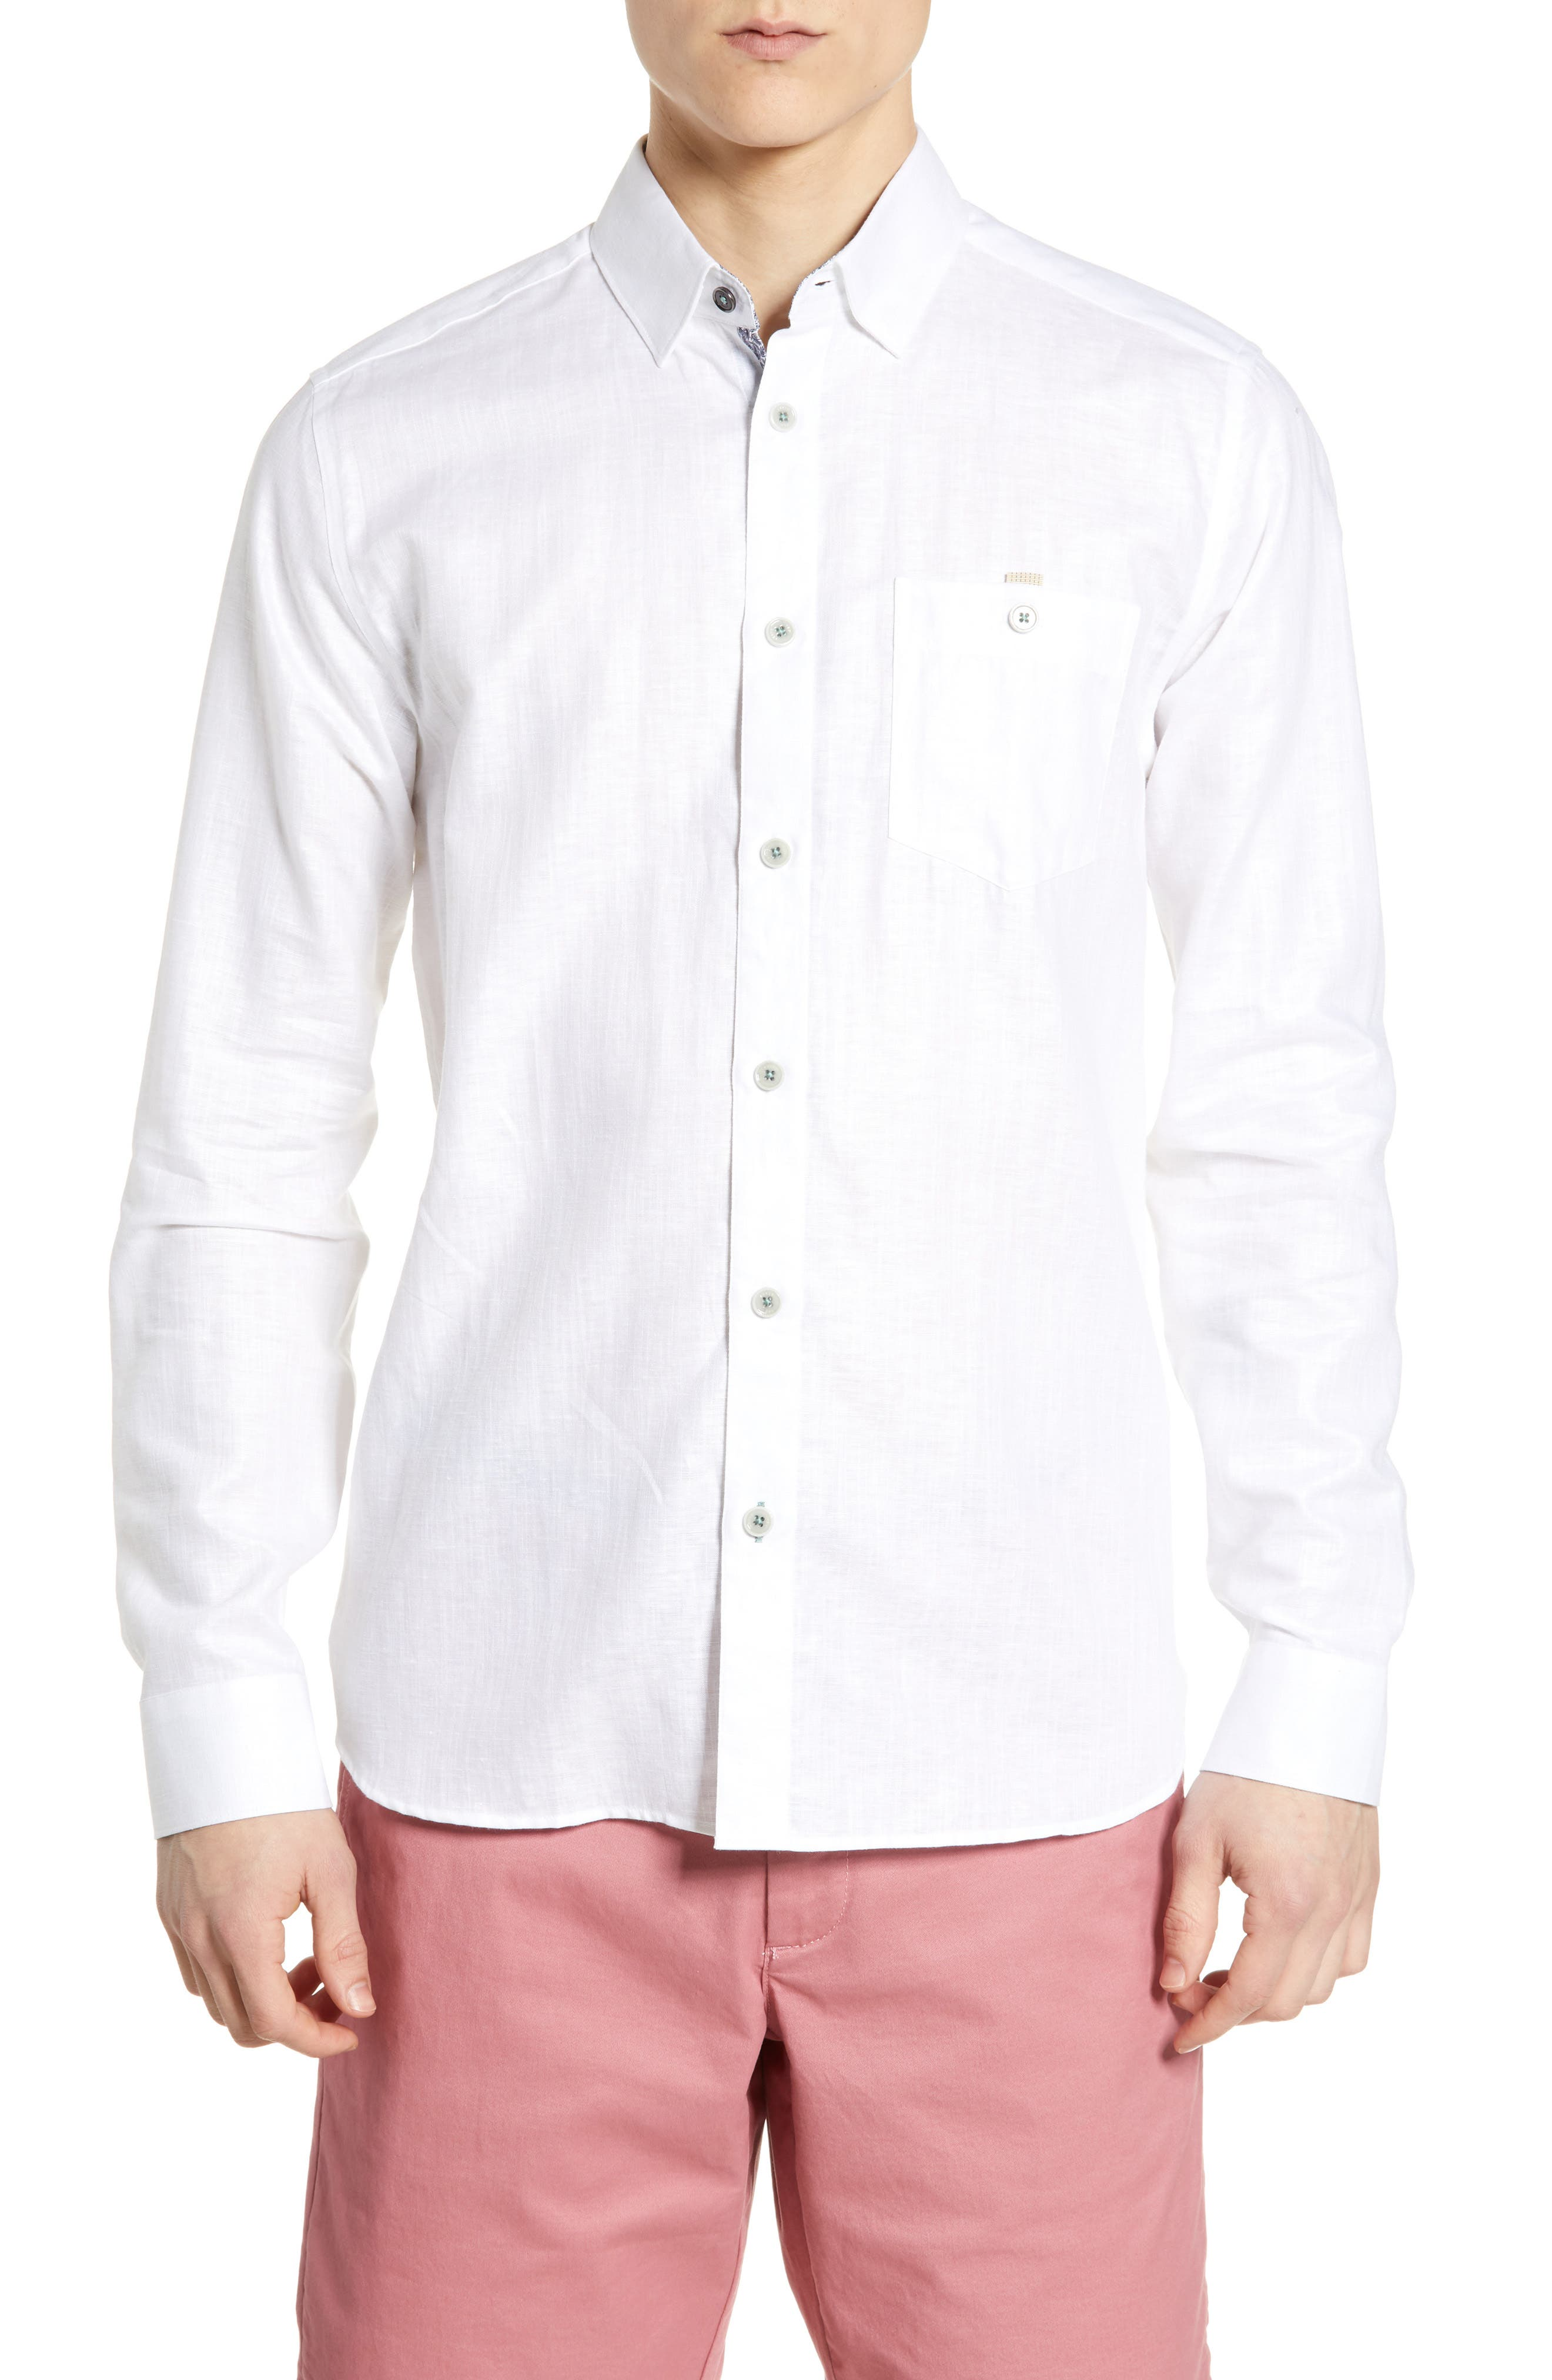 TED BAKER LONDON, Emuu Slim Fit Linen Shirt, Main thumbnail 1, color, WHITE